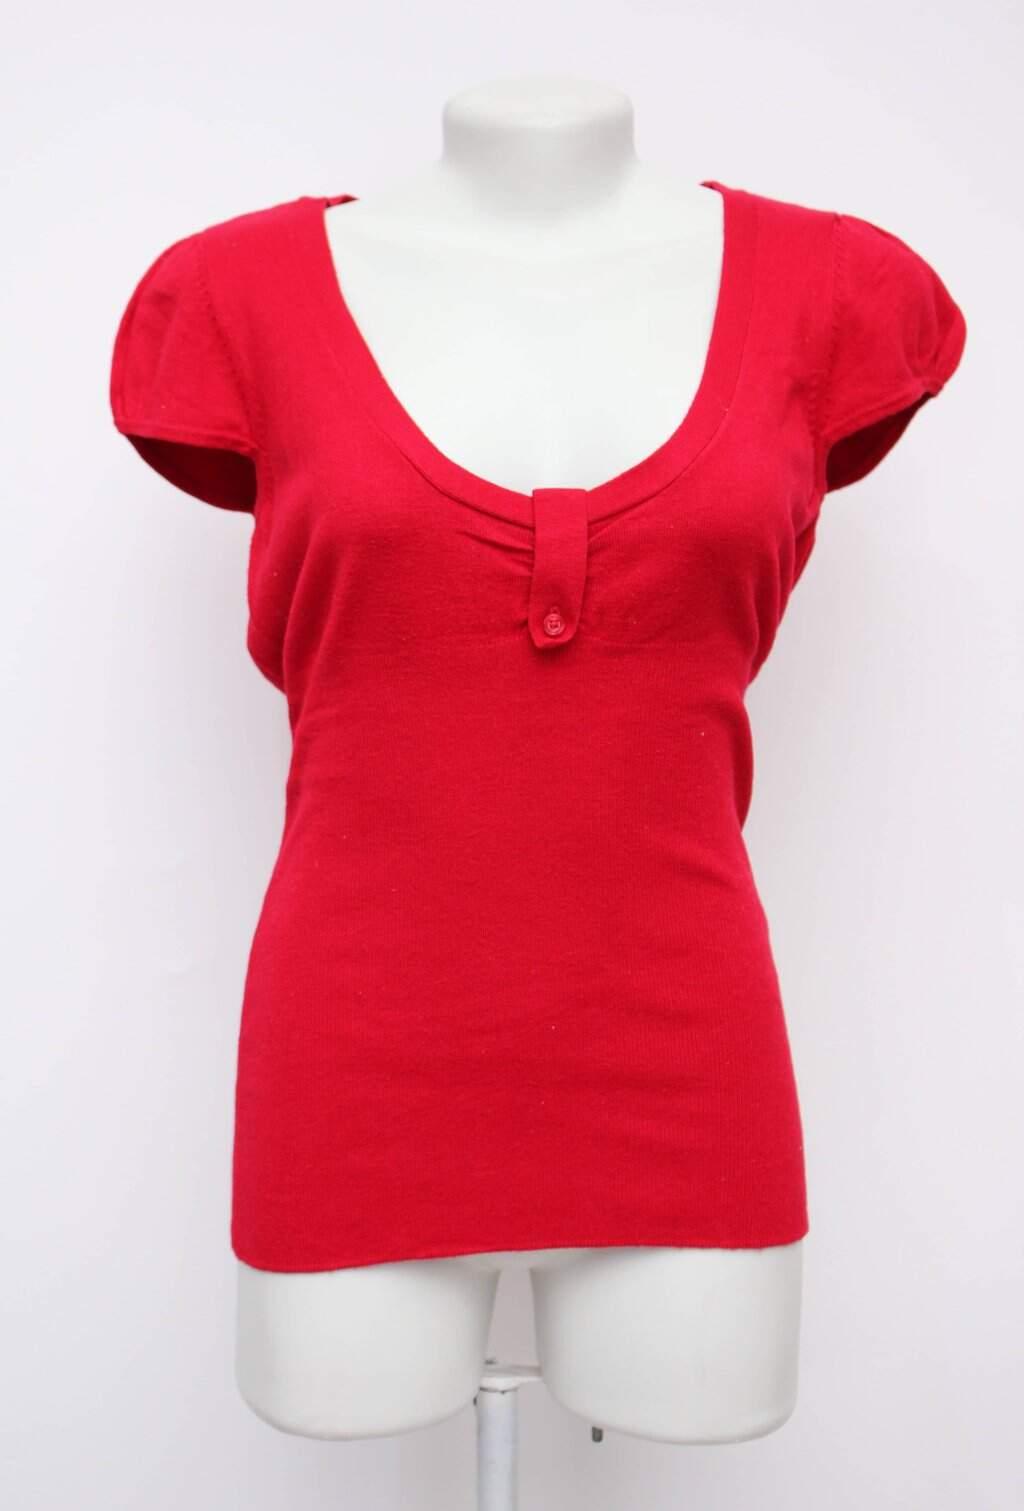 Blusa vermelha luigi bertolli